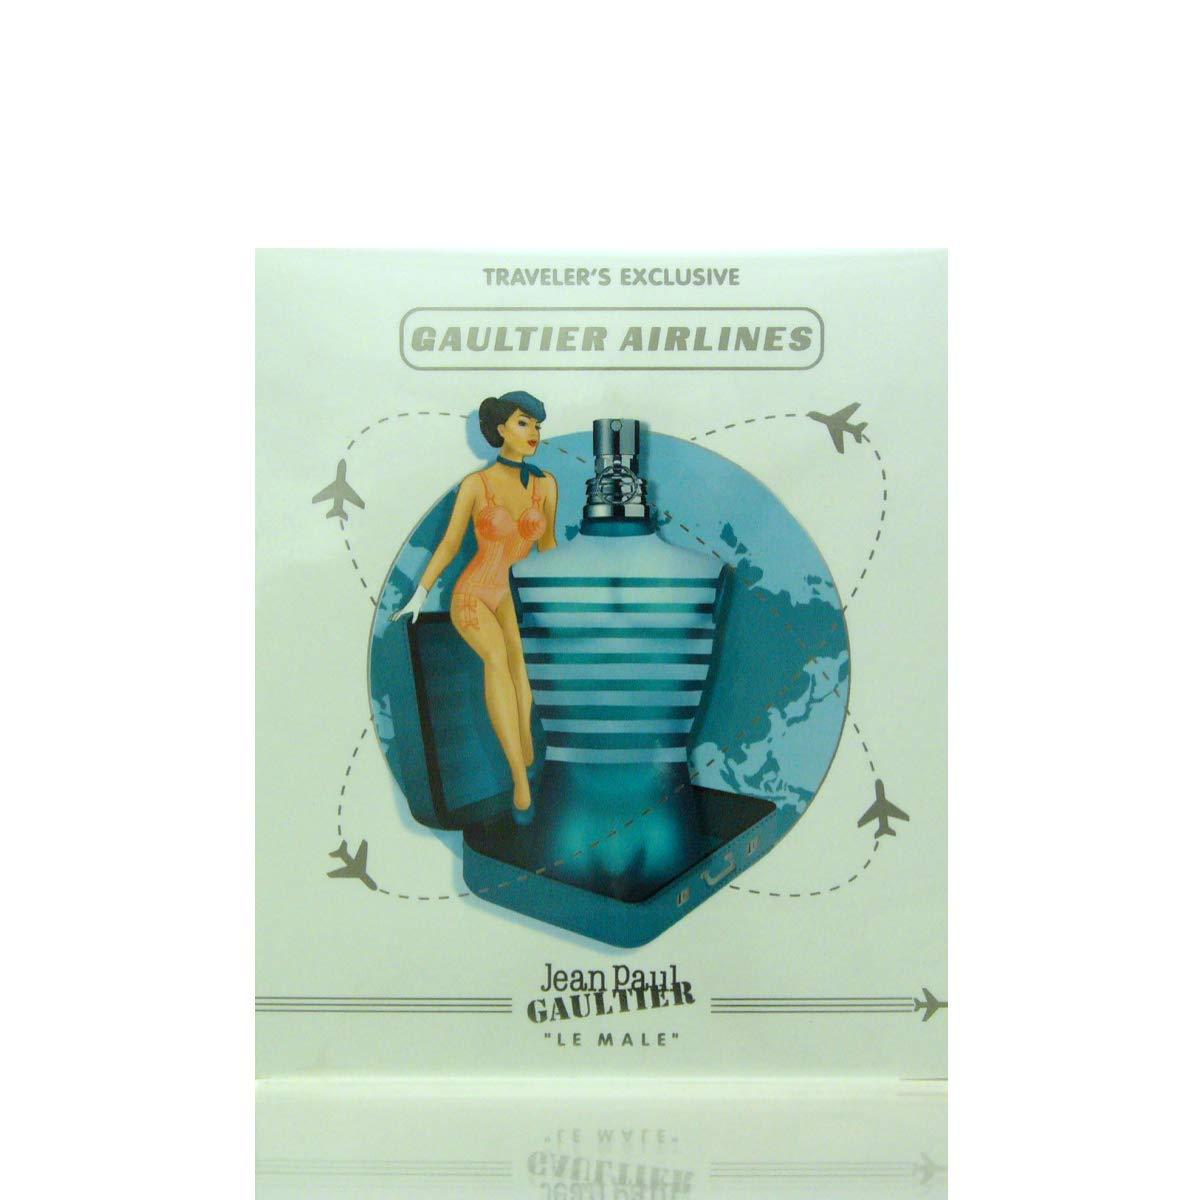 Jean Paul Gautier 2 Pcs Gift set 125 ml EDT Spray and 20 ml